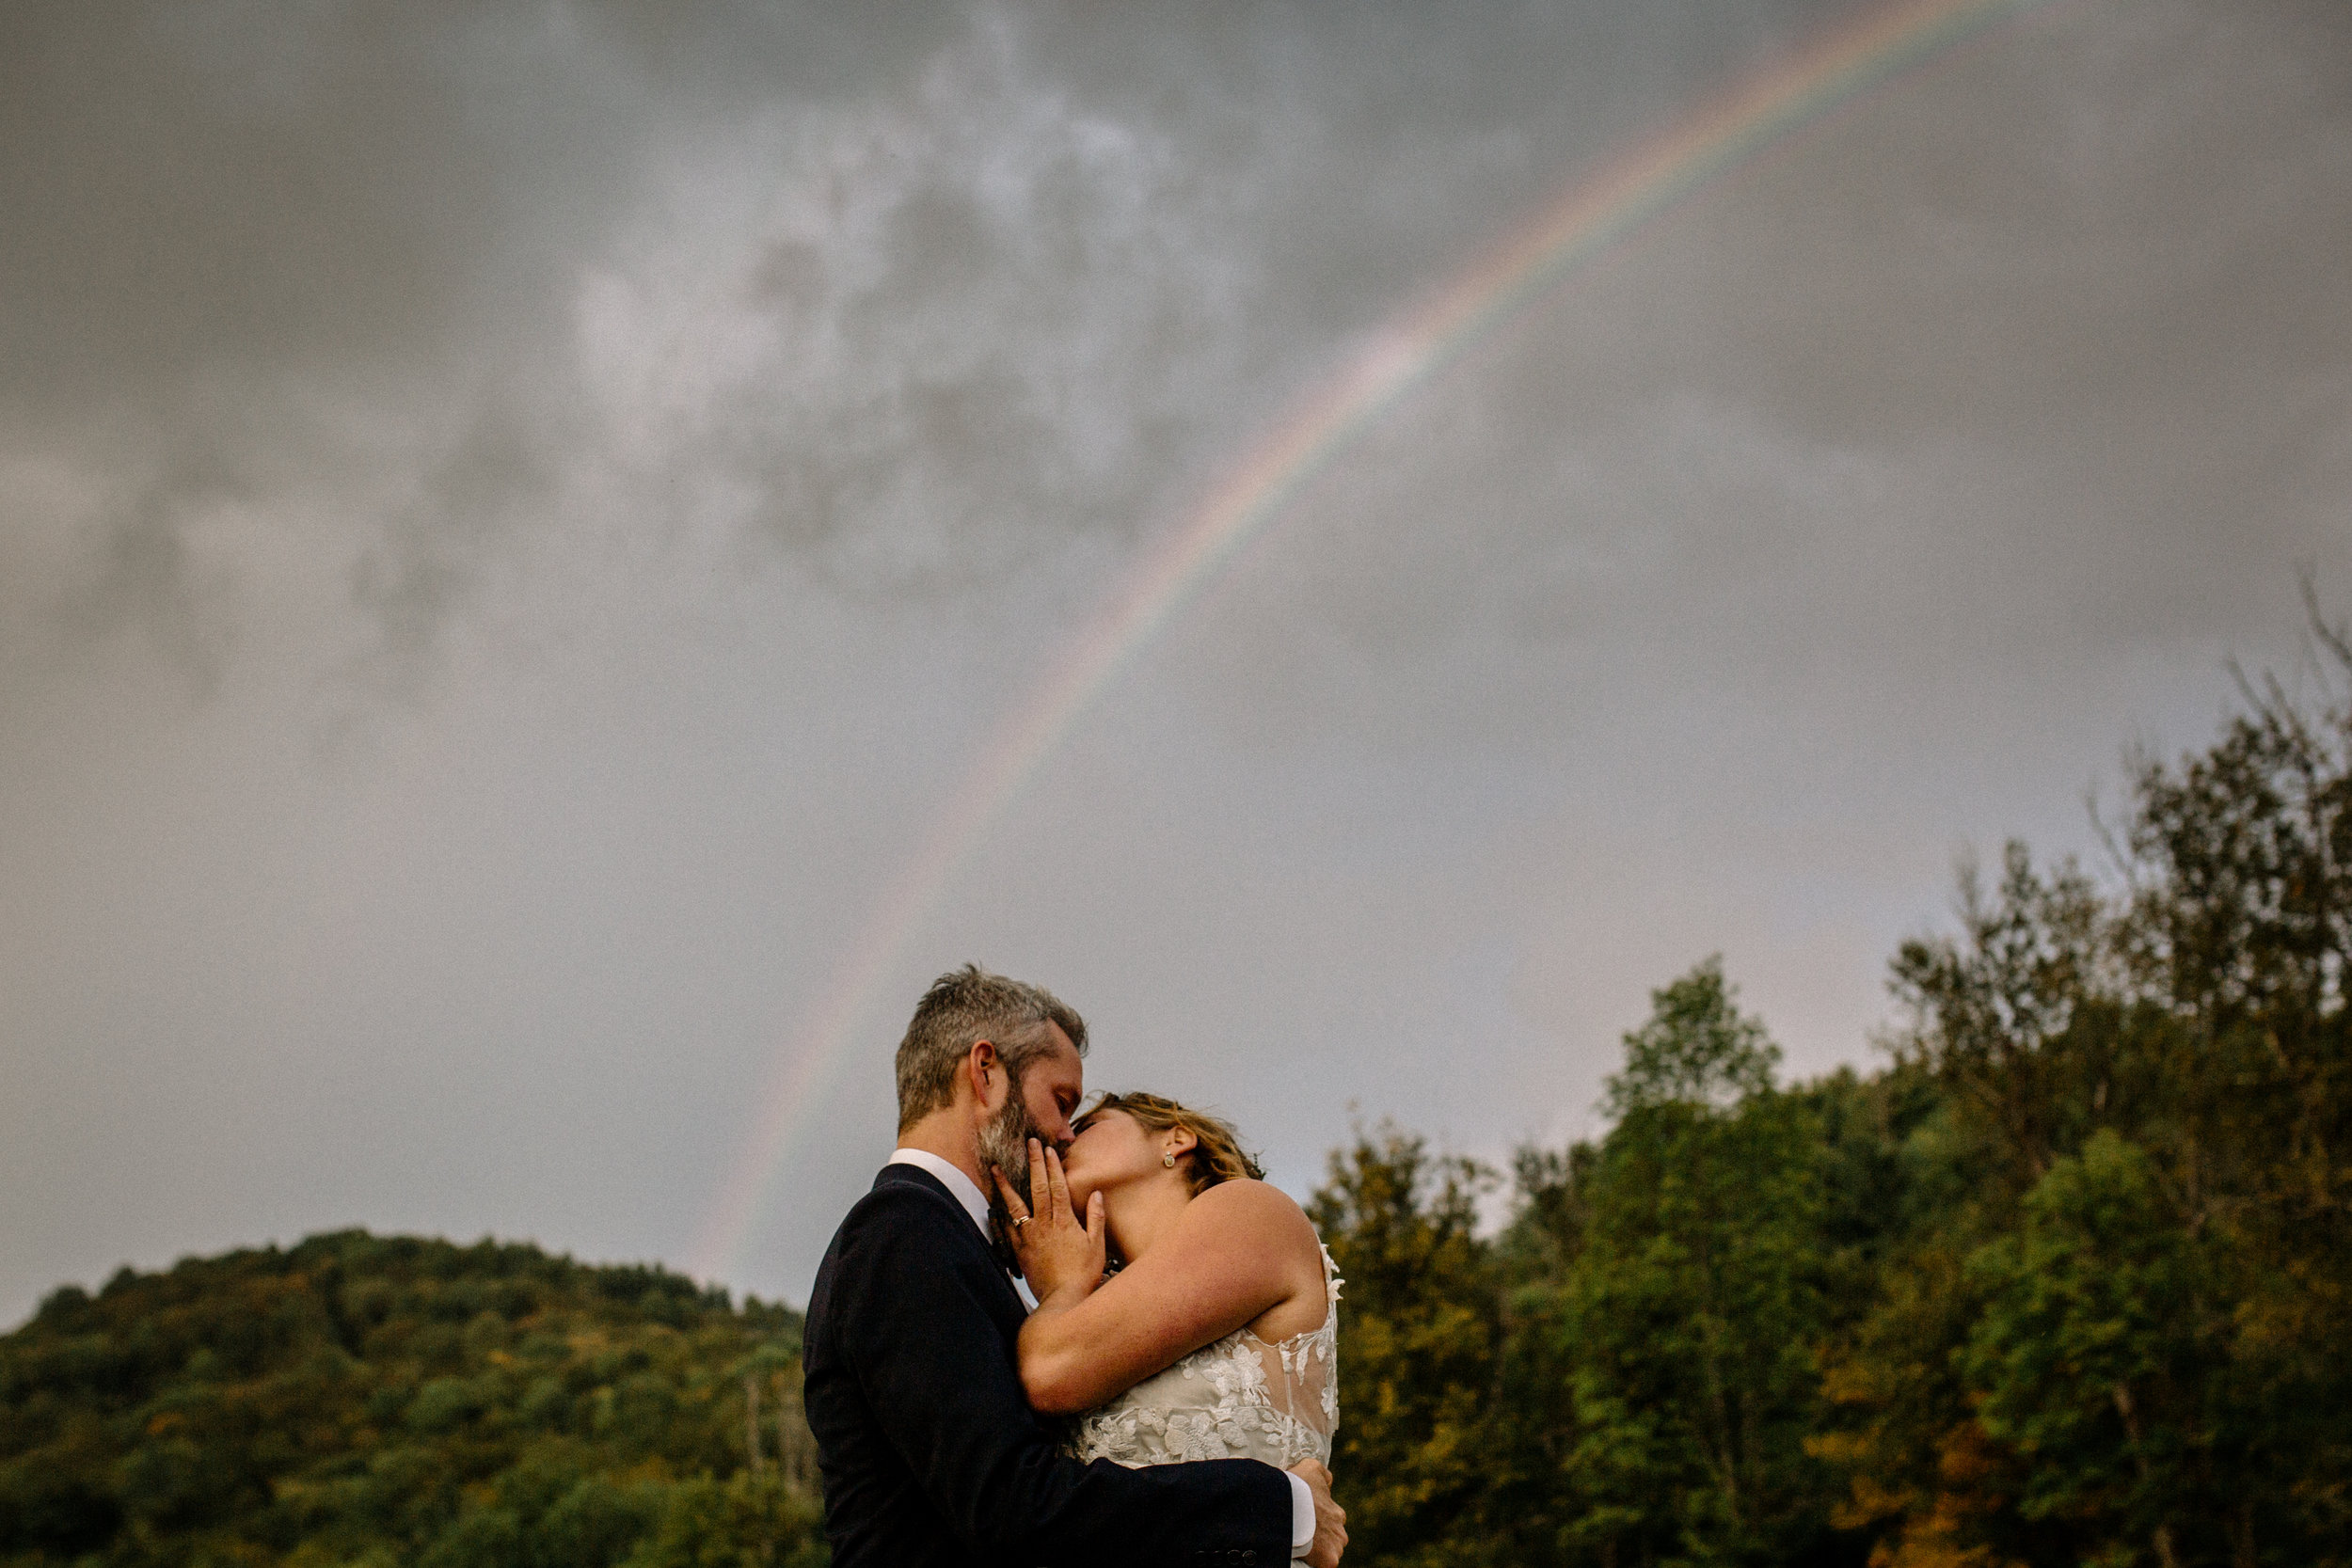 tess_jim_rainbow1.jpg